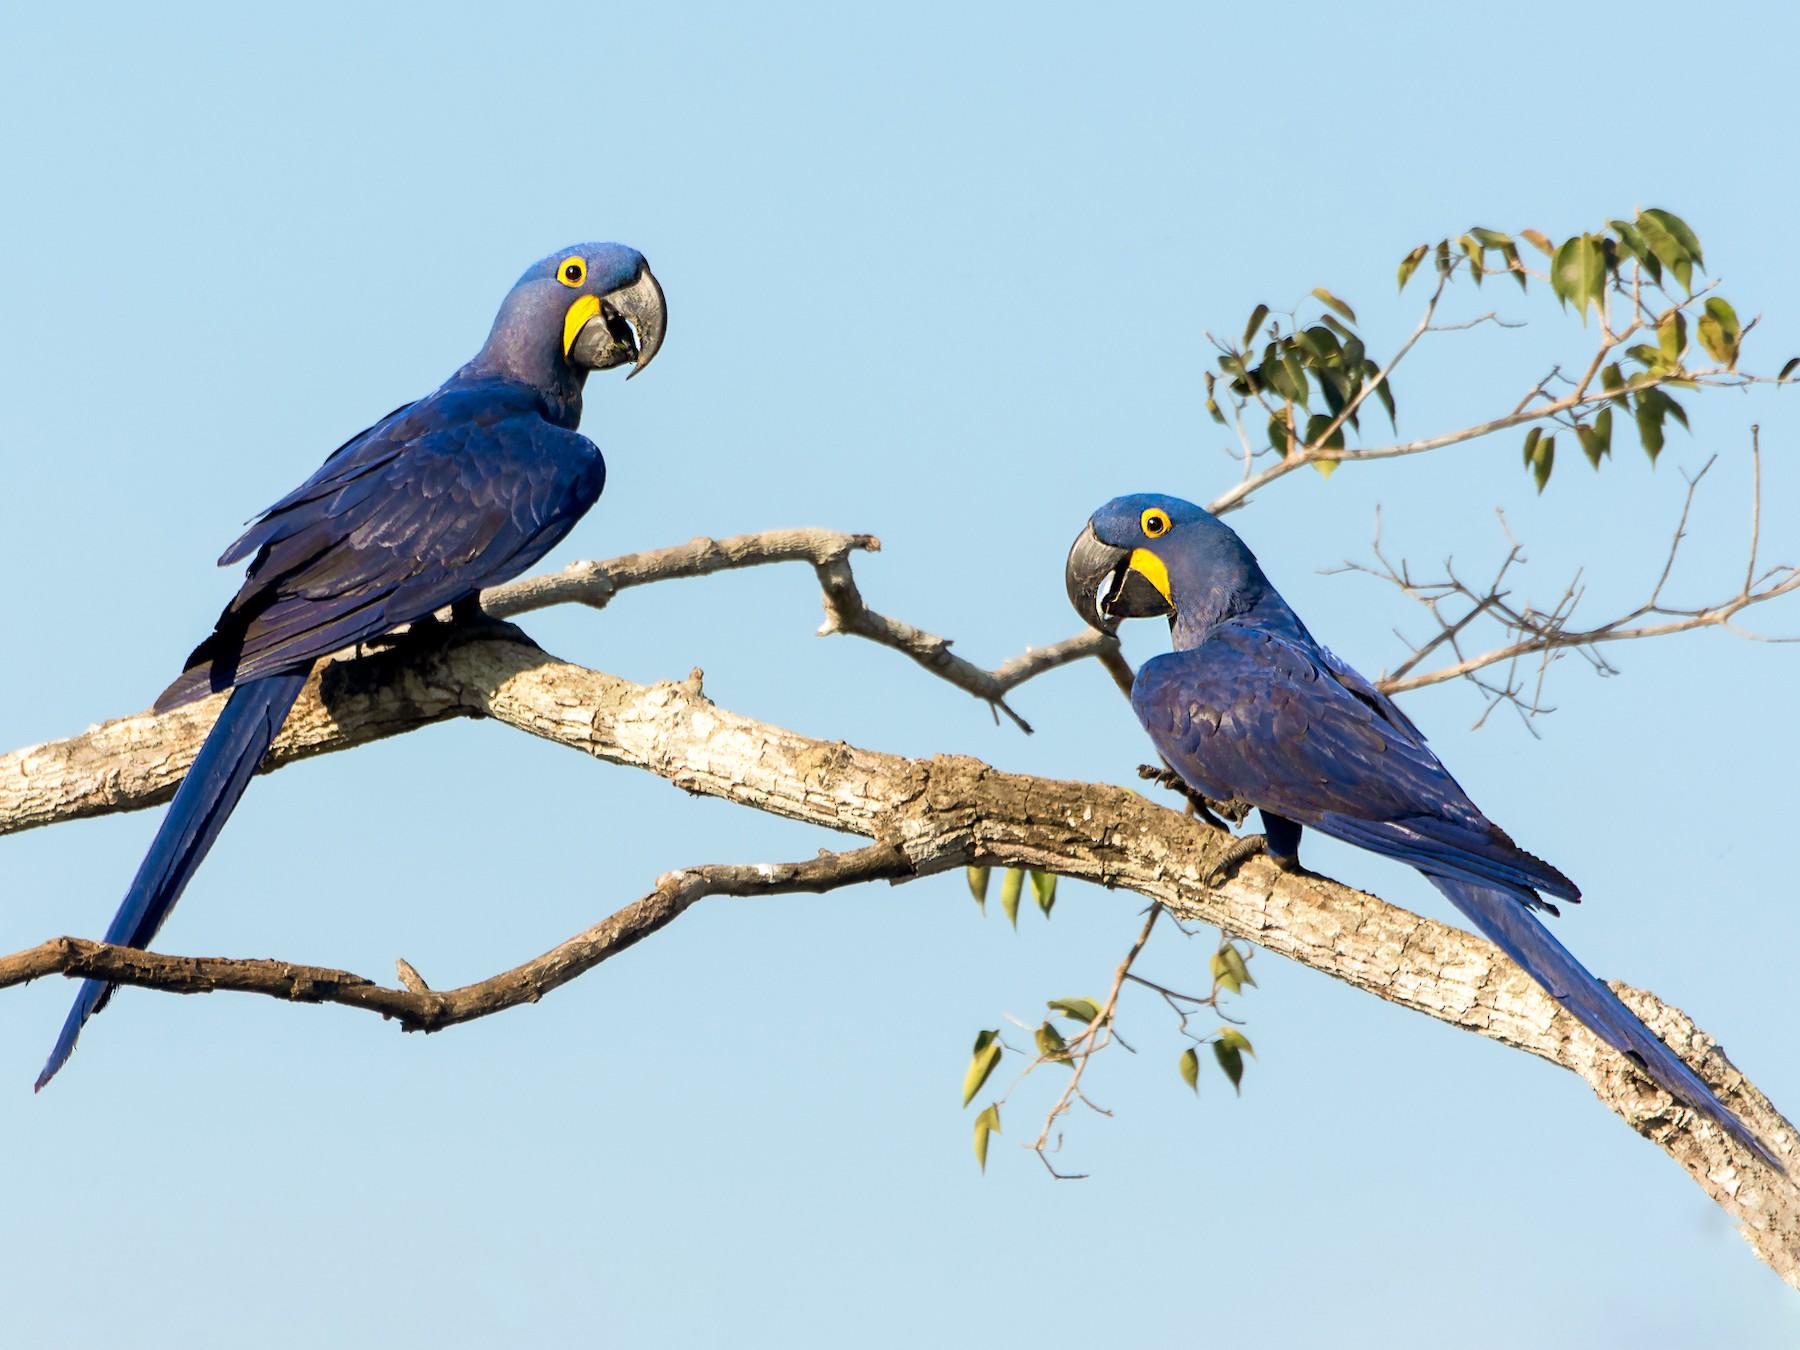 Hyacinth Macaw - George Pagos